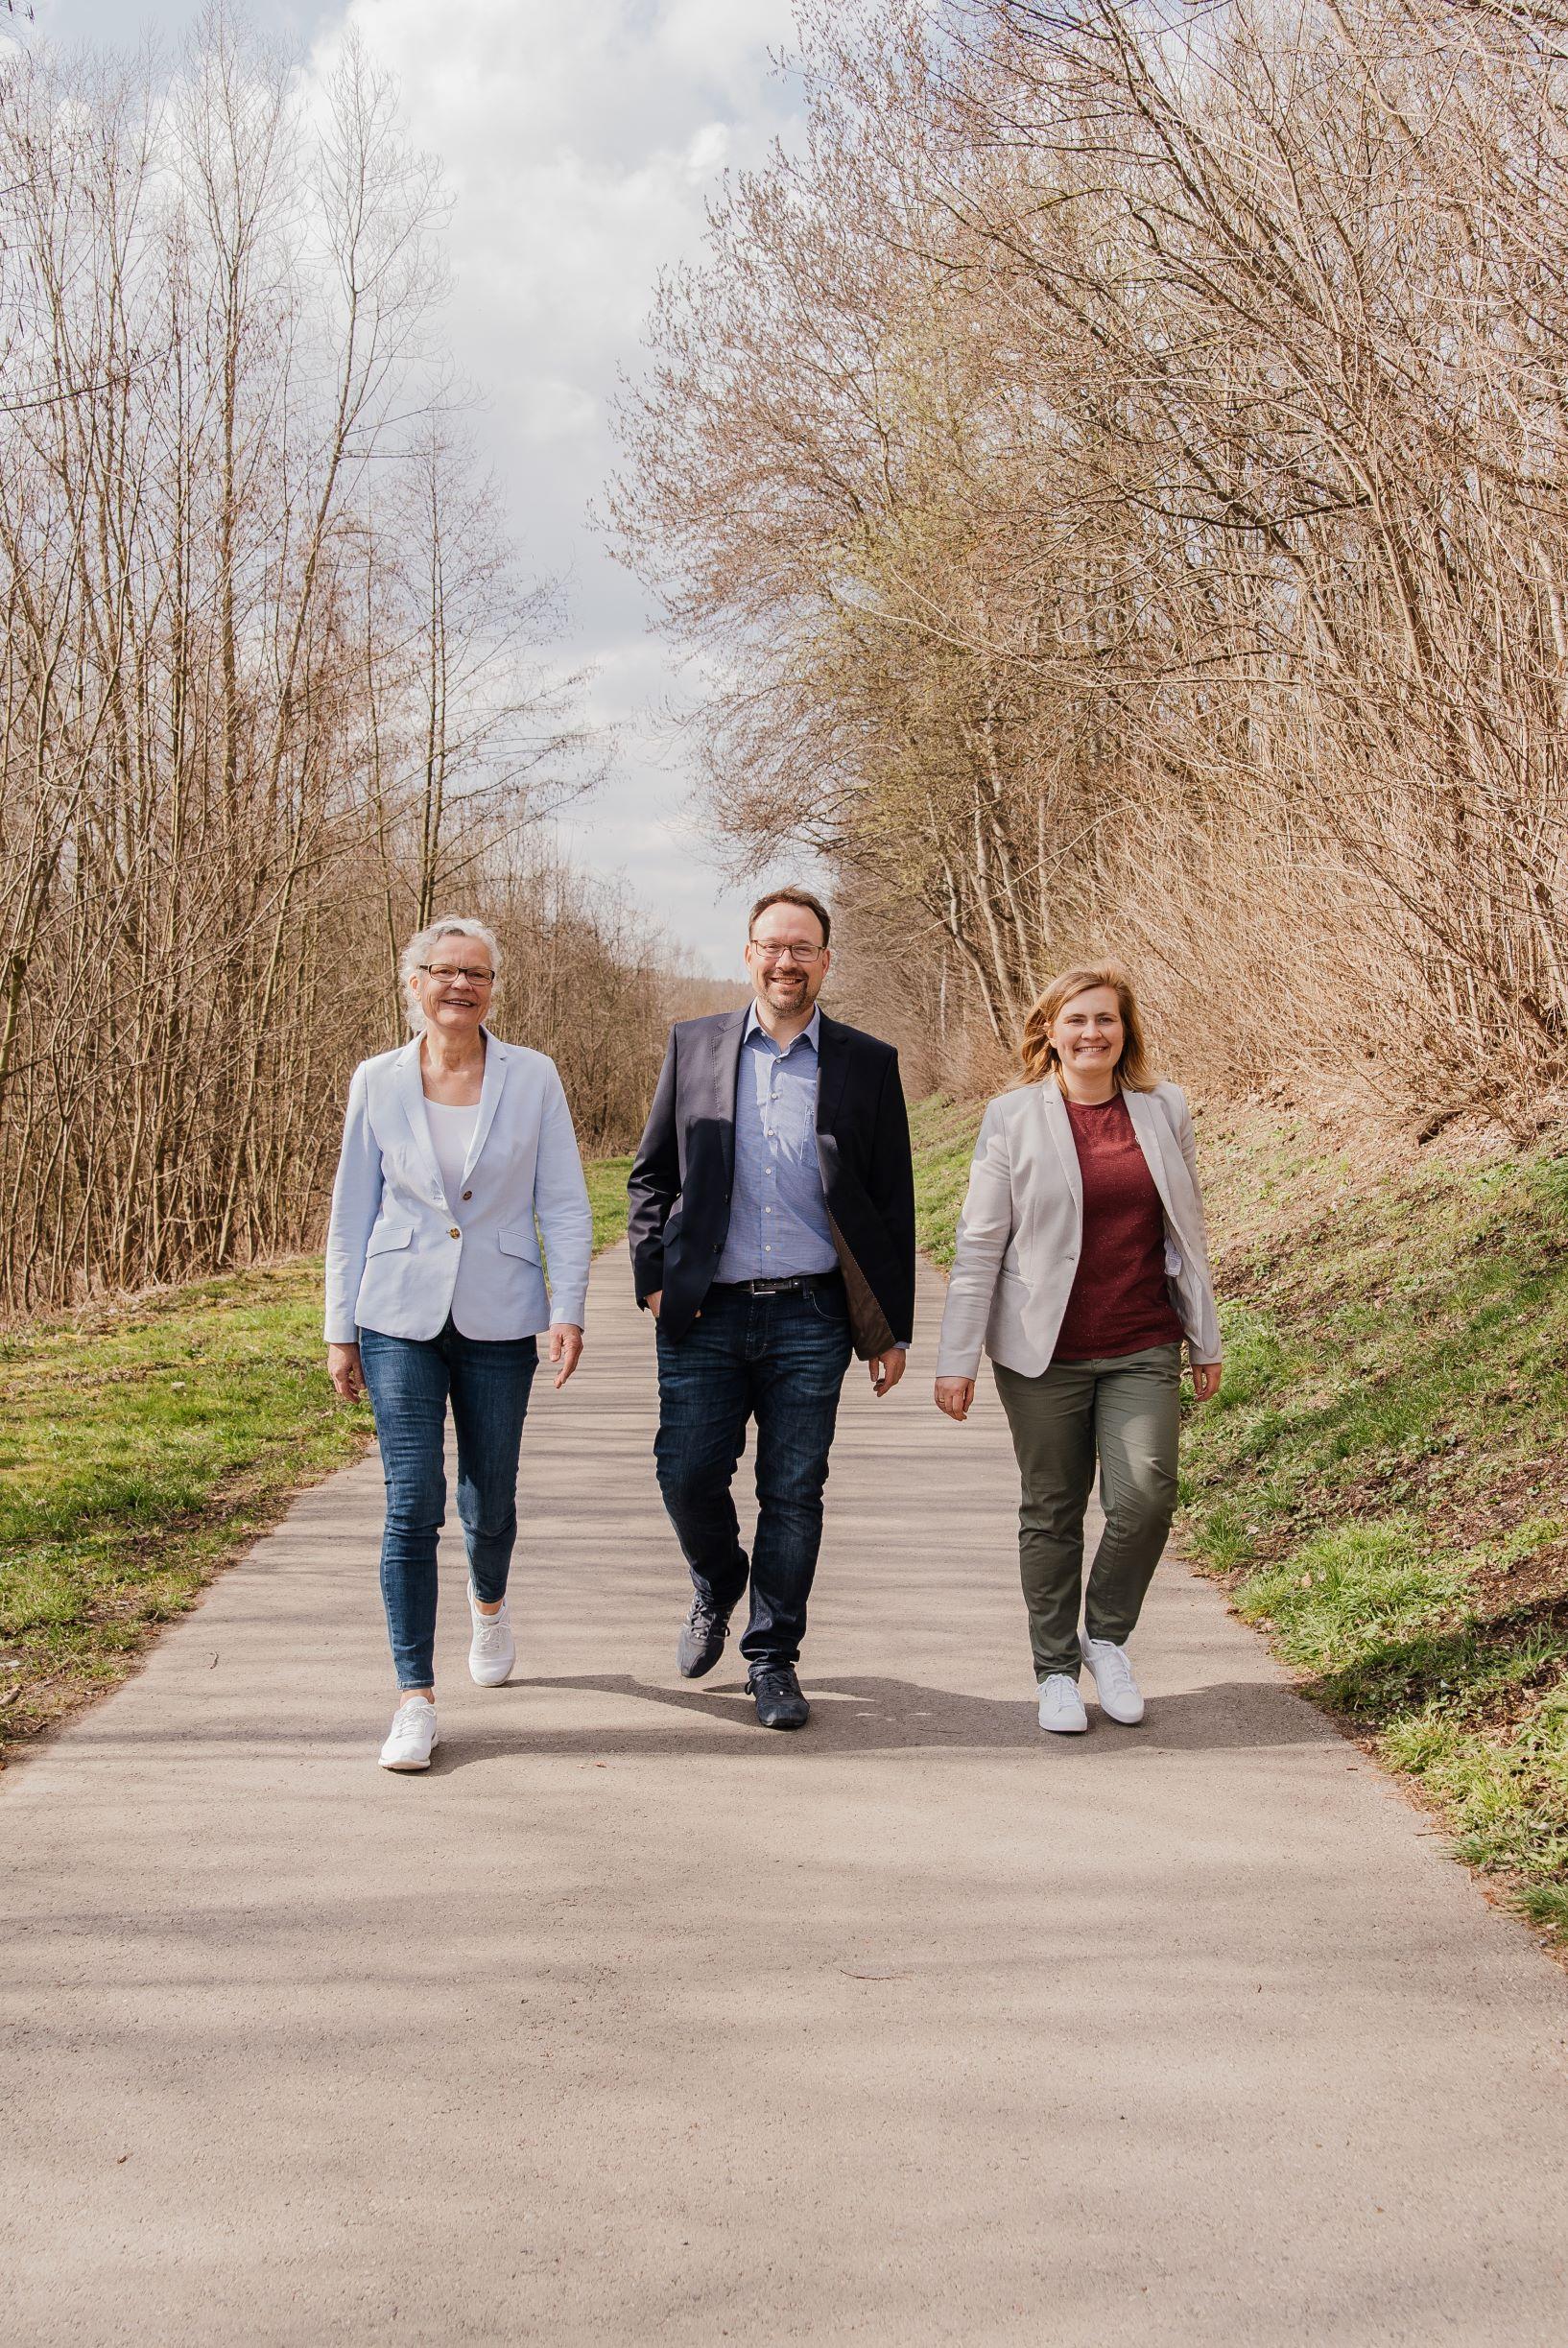 Silvia Kaufhold, Maximilian Burchardt, Anna Frieler